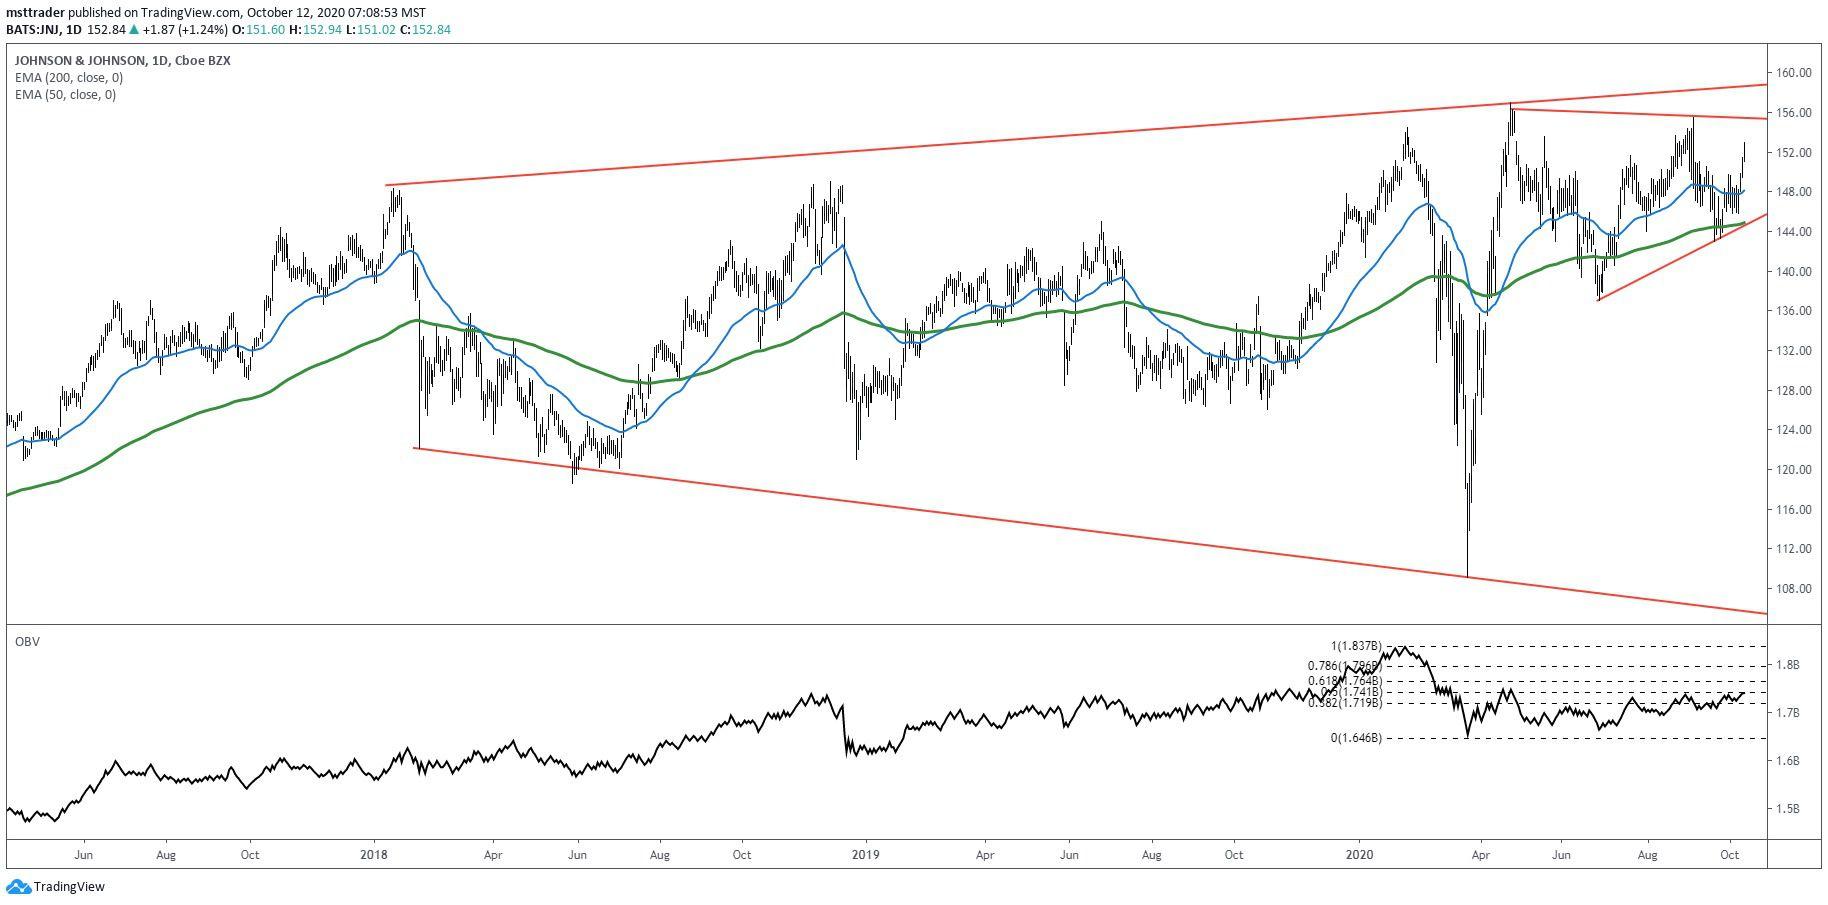 Short-term chart showing the share price performance of Johnson & Johnson (JNJ)